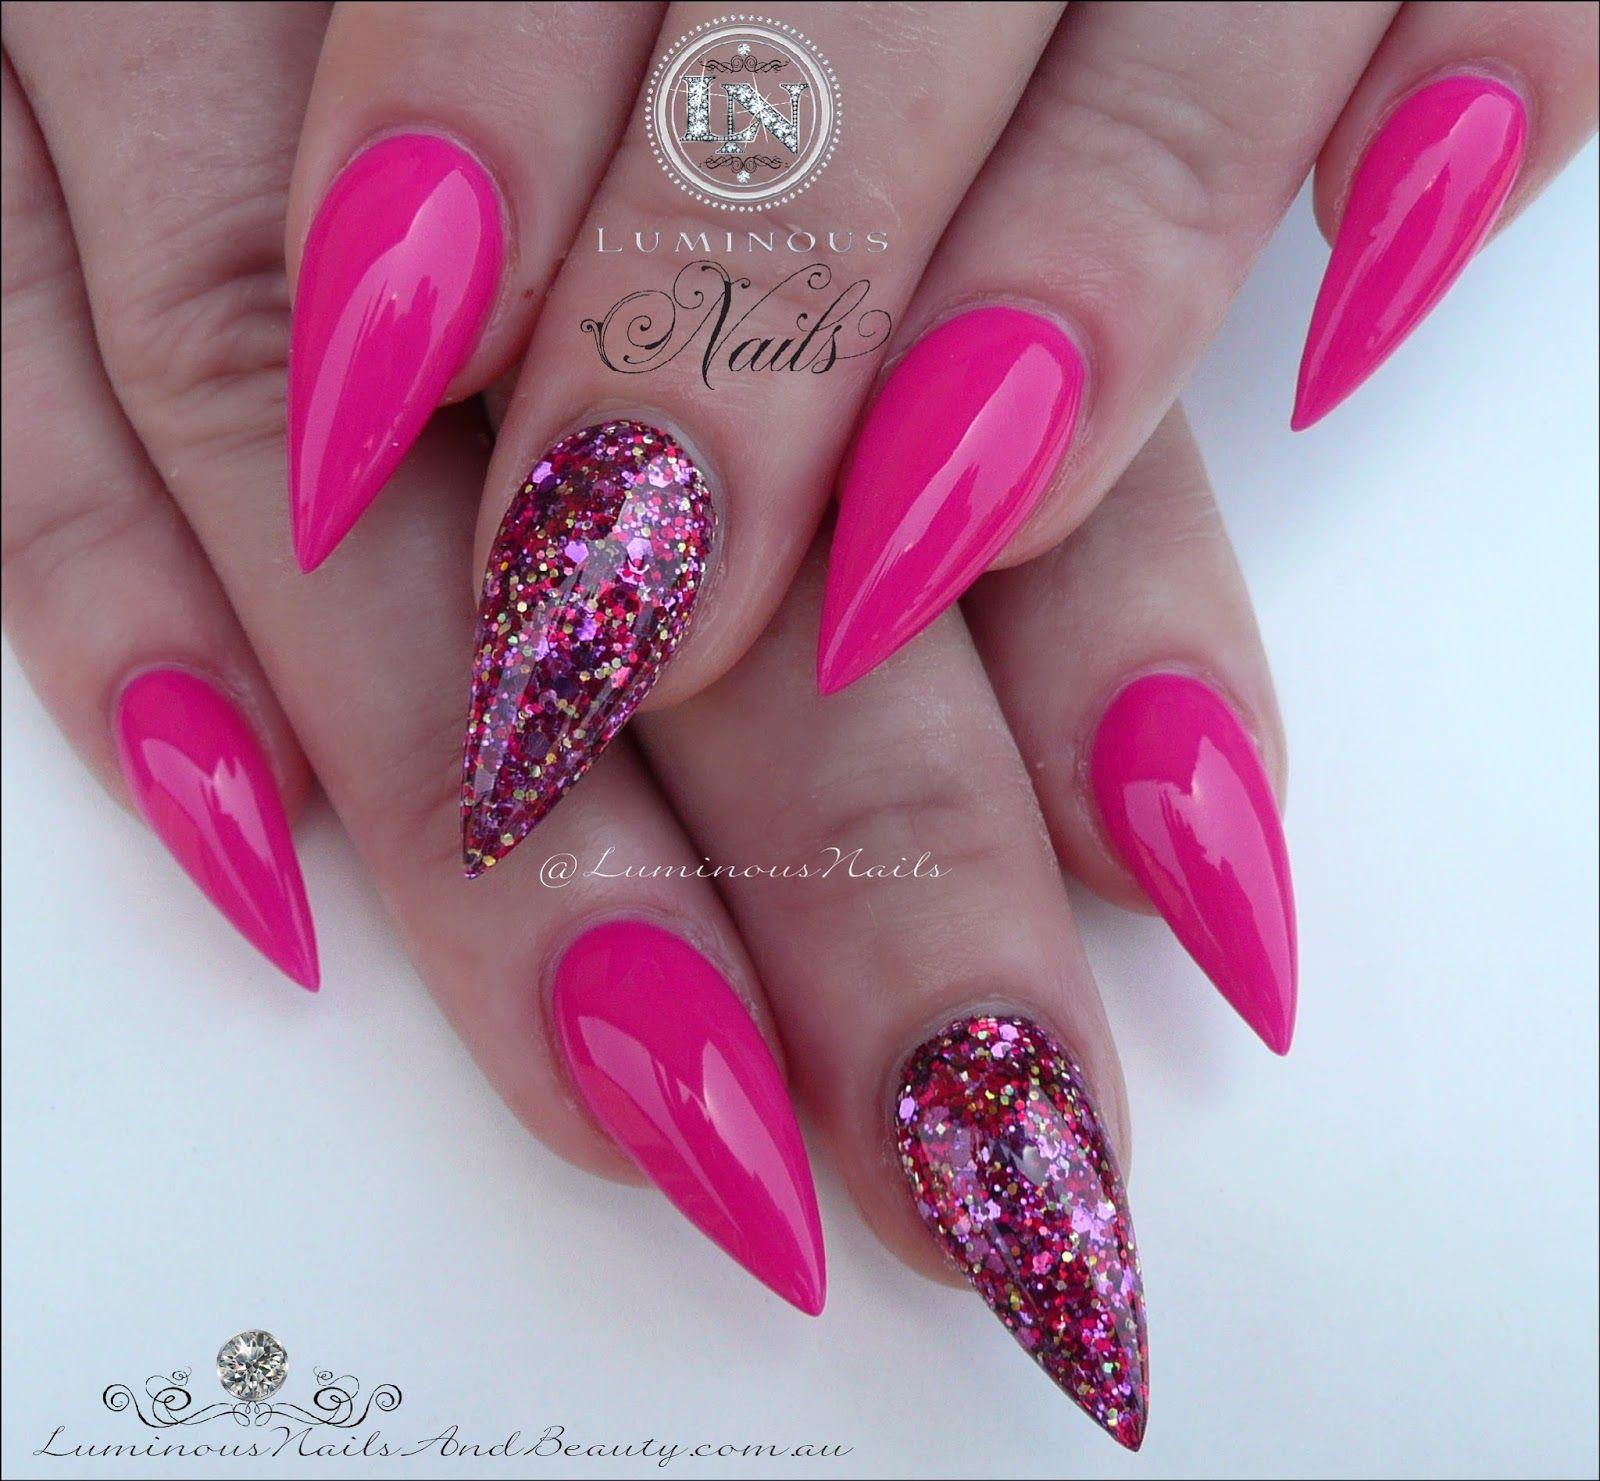 Luminous+Nails+%26+Beauty%2C+Gold+Coast+QLD.+Fuchsia+Pink+Nails%2C+ ...